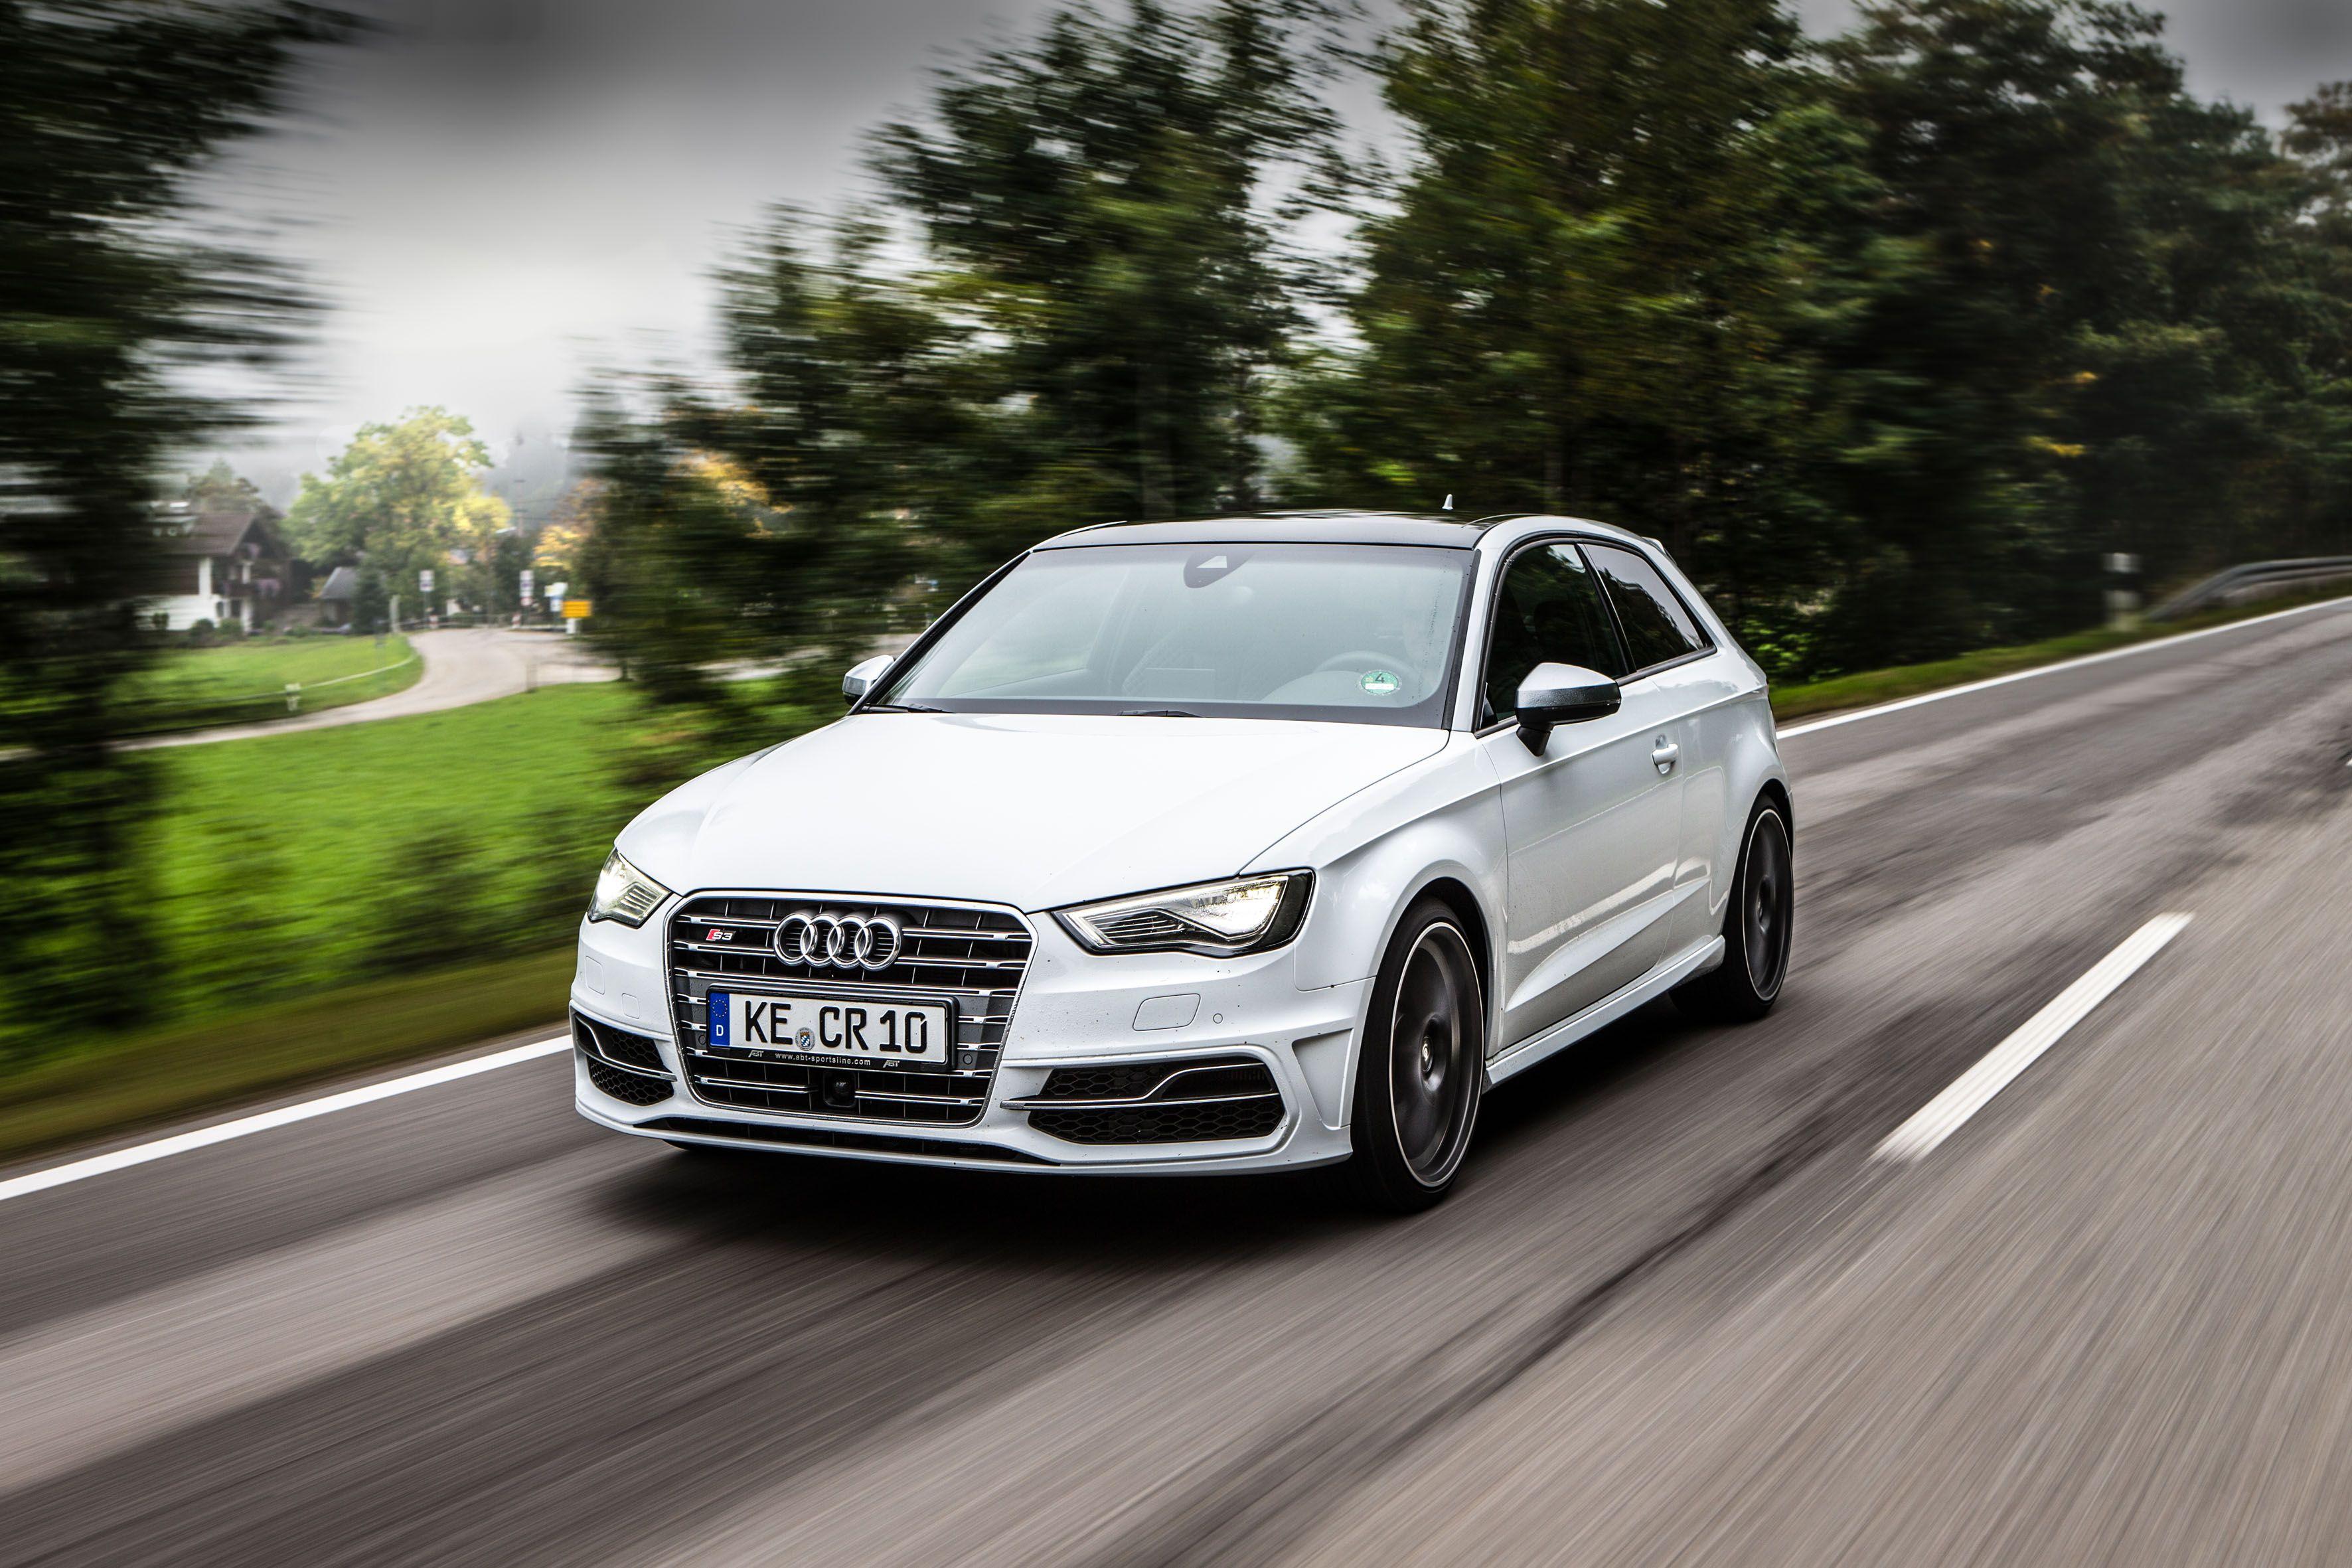 neuer_Abt_S3_Audi_S3_Tuning_Abt_Sportsline_1